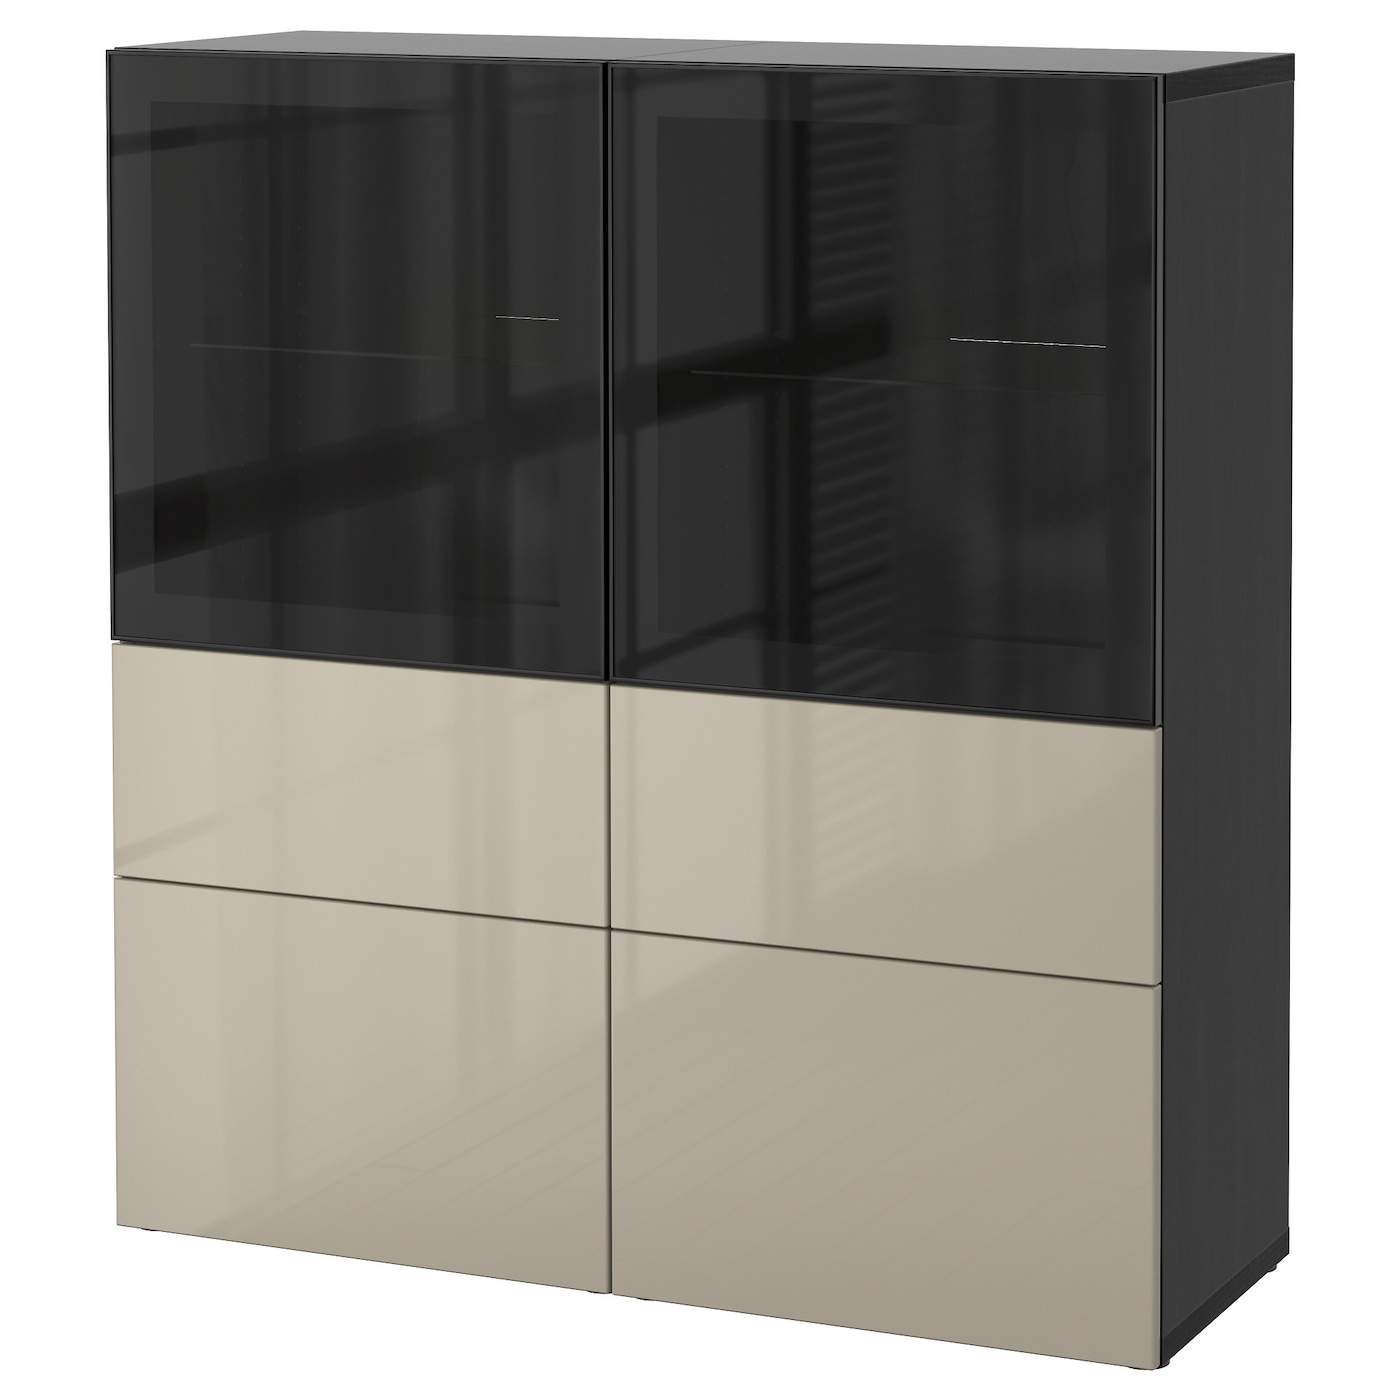 Merveilleux IKEA BESTÅ Storage Combination W Glass Doors